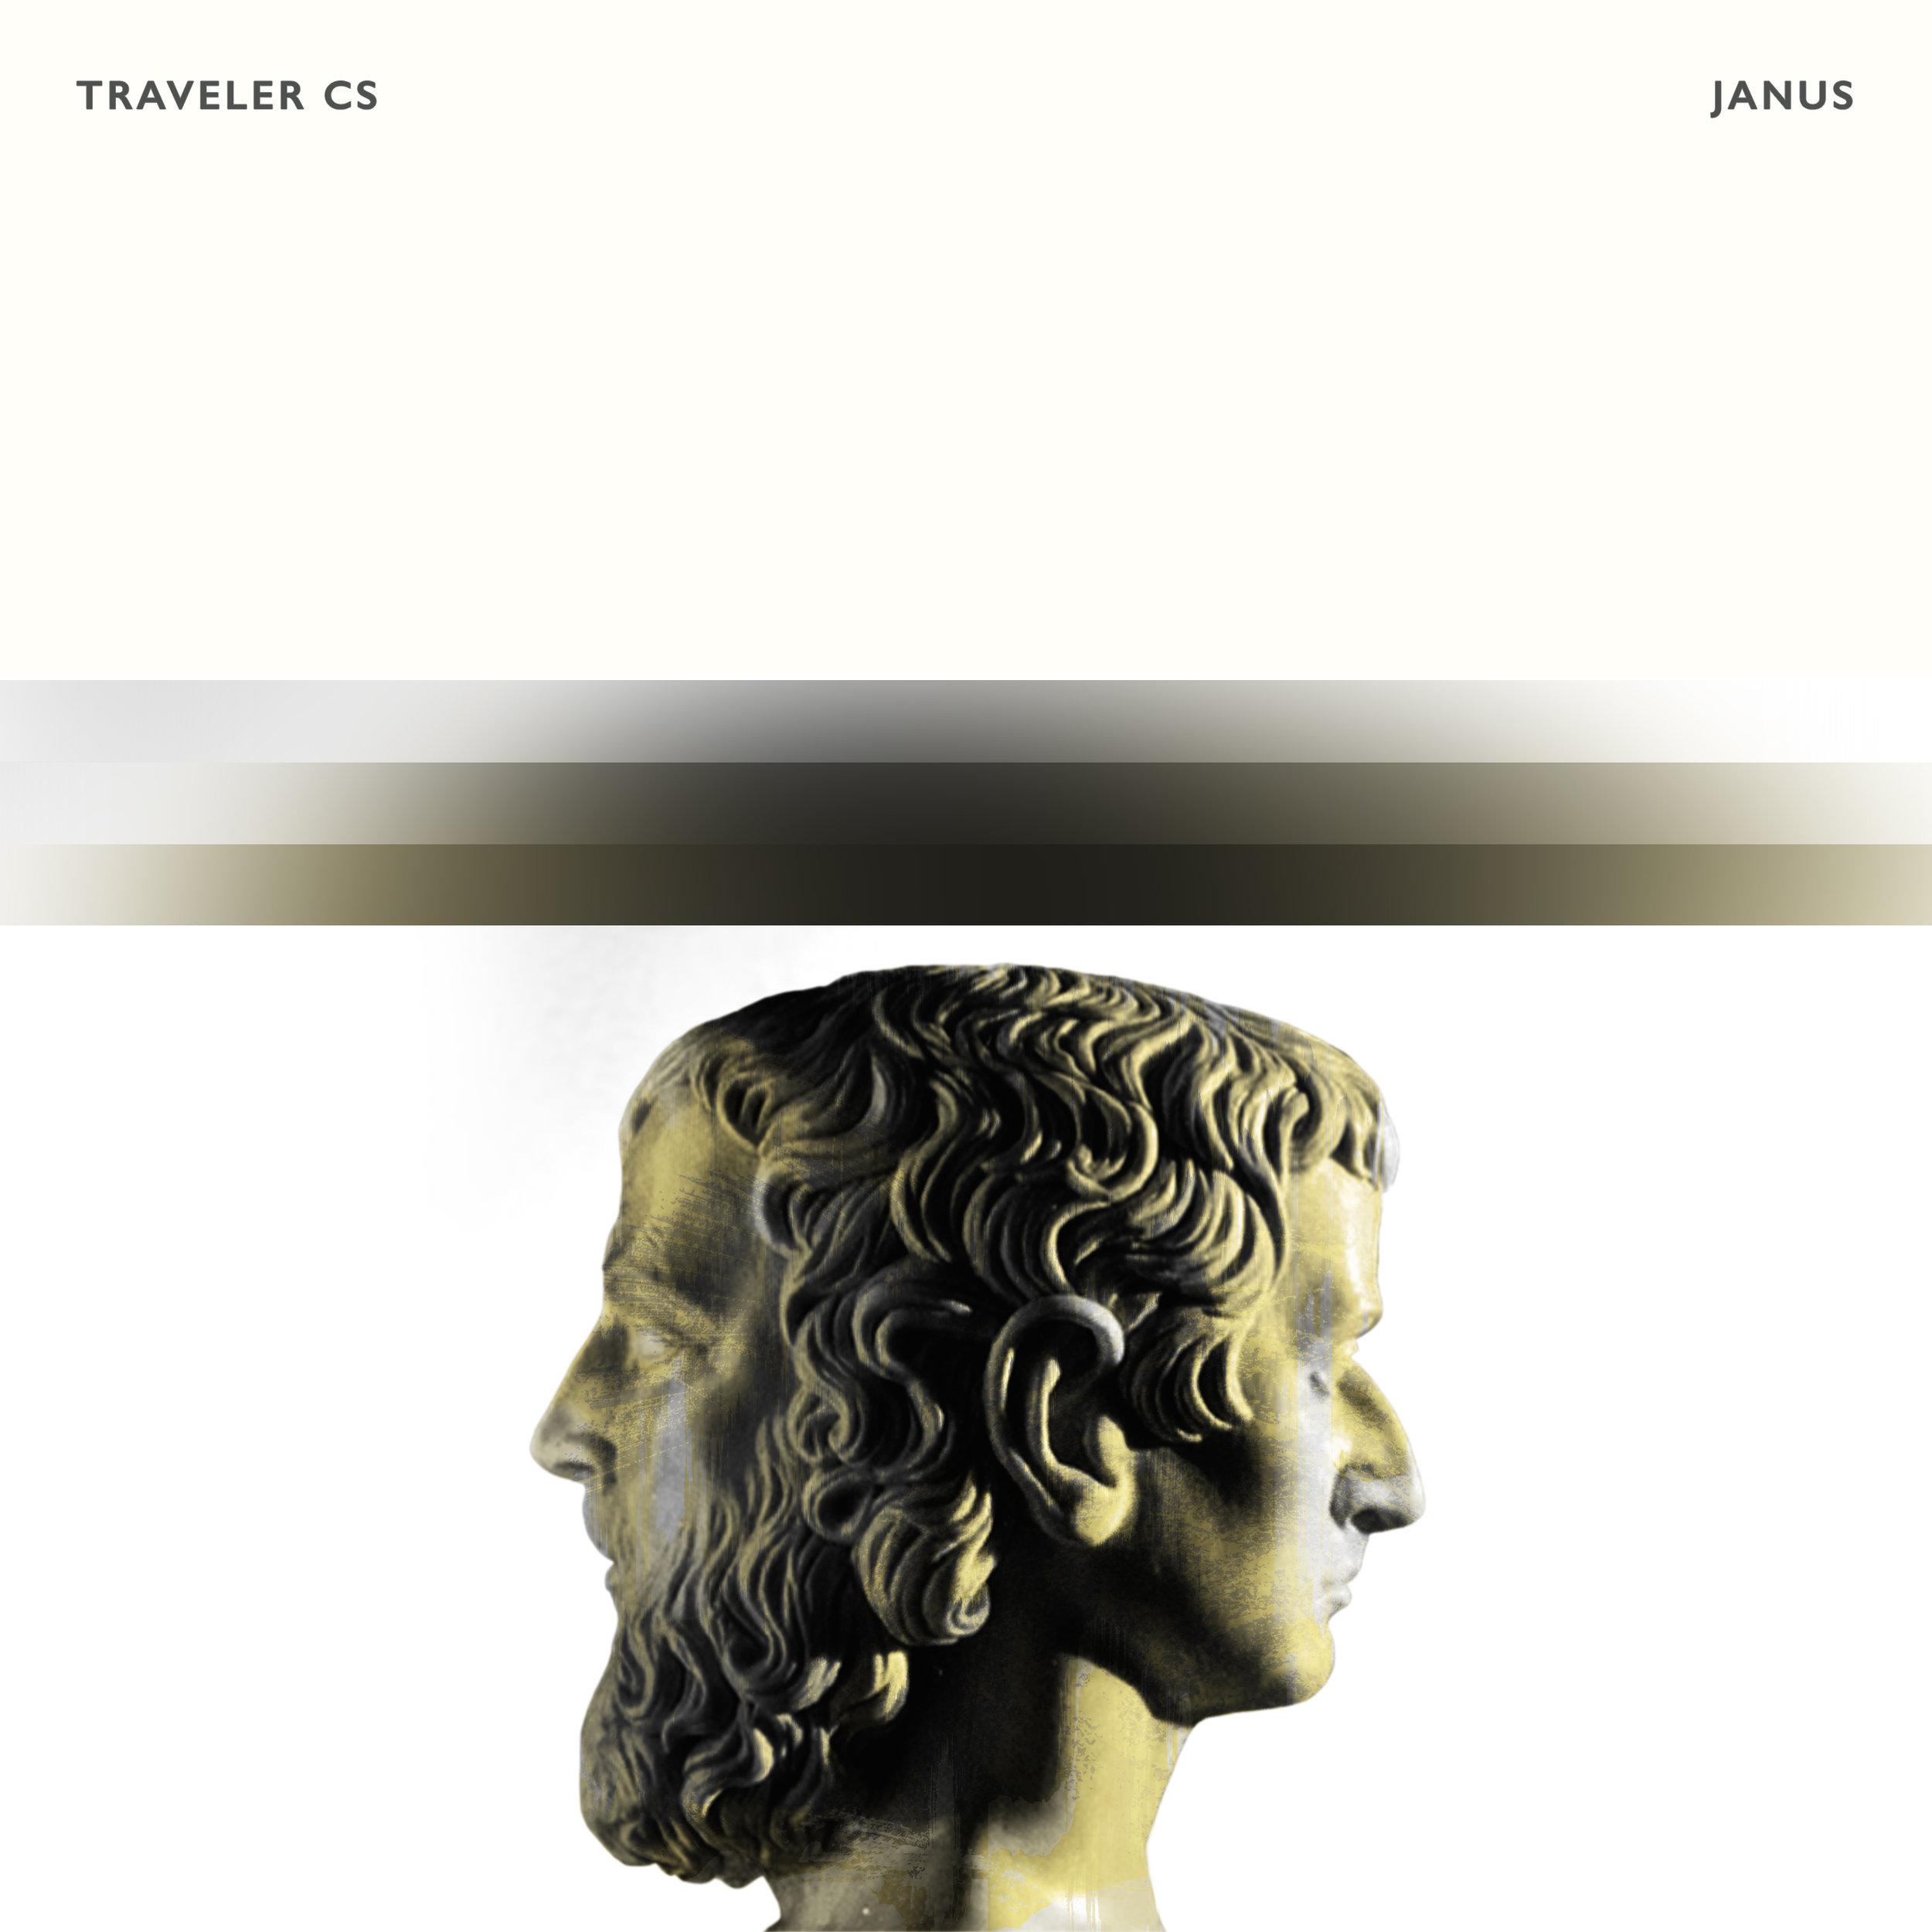 Traveler CS - Janus